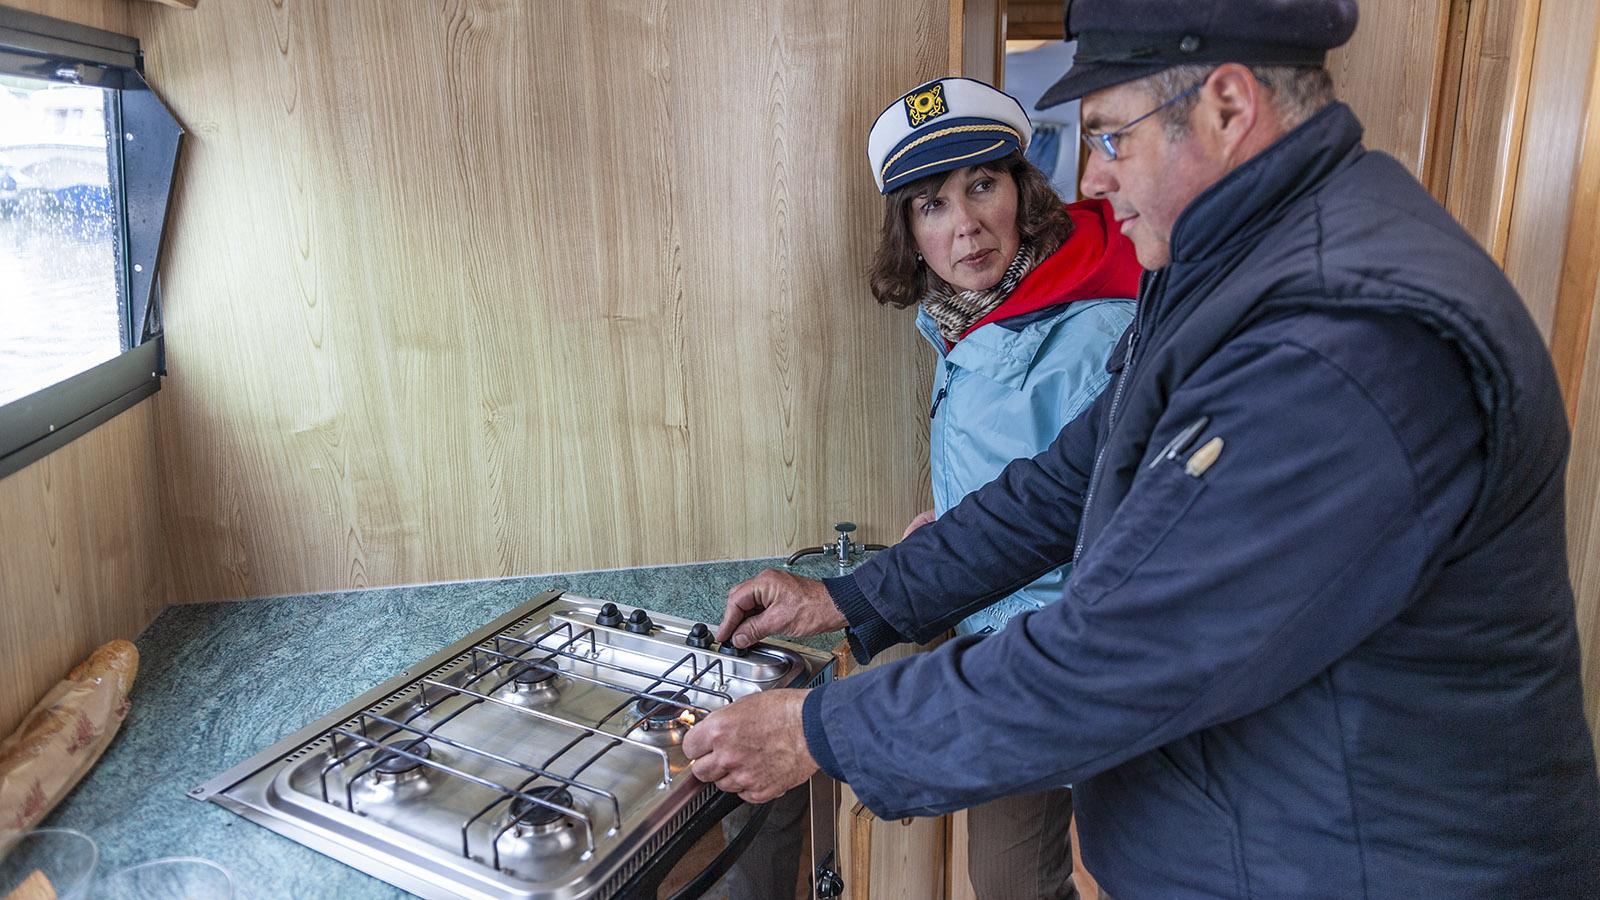 Le Boat: der Gasherd an Bord von MS Caprice. Foto: Hilke Maunder